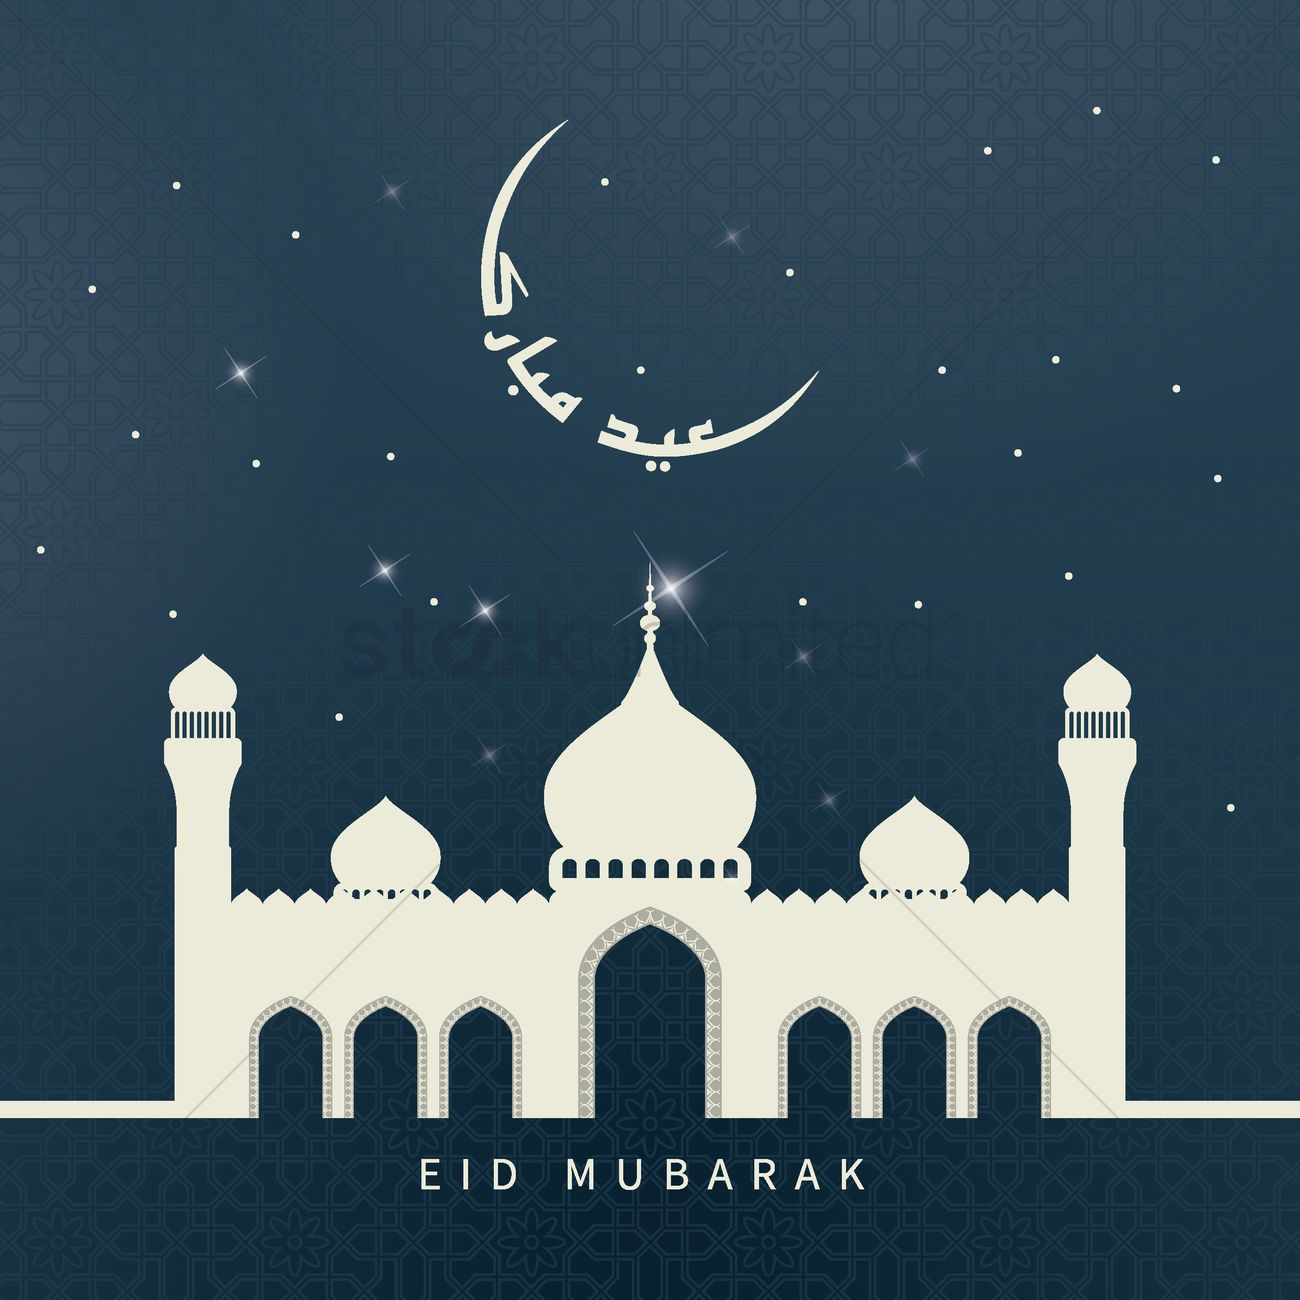 Eid mubarak greeting vector image 1828267 stockunlimited eid mubarak greeting vector graphic m4hsunfo